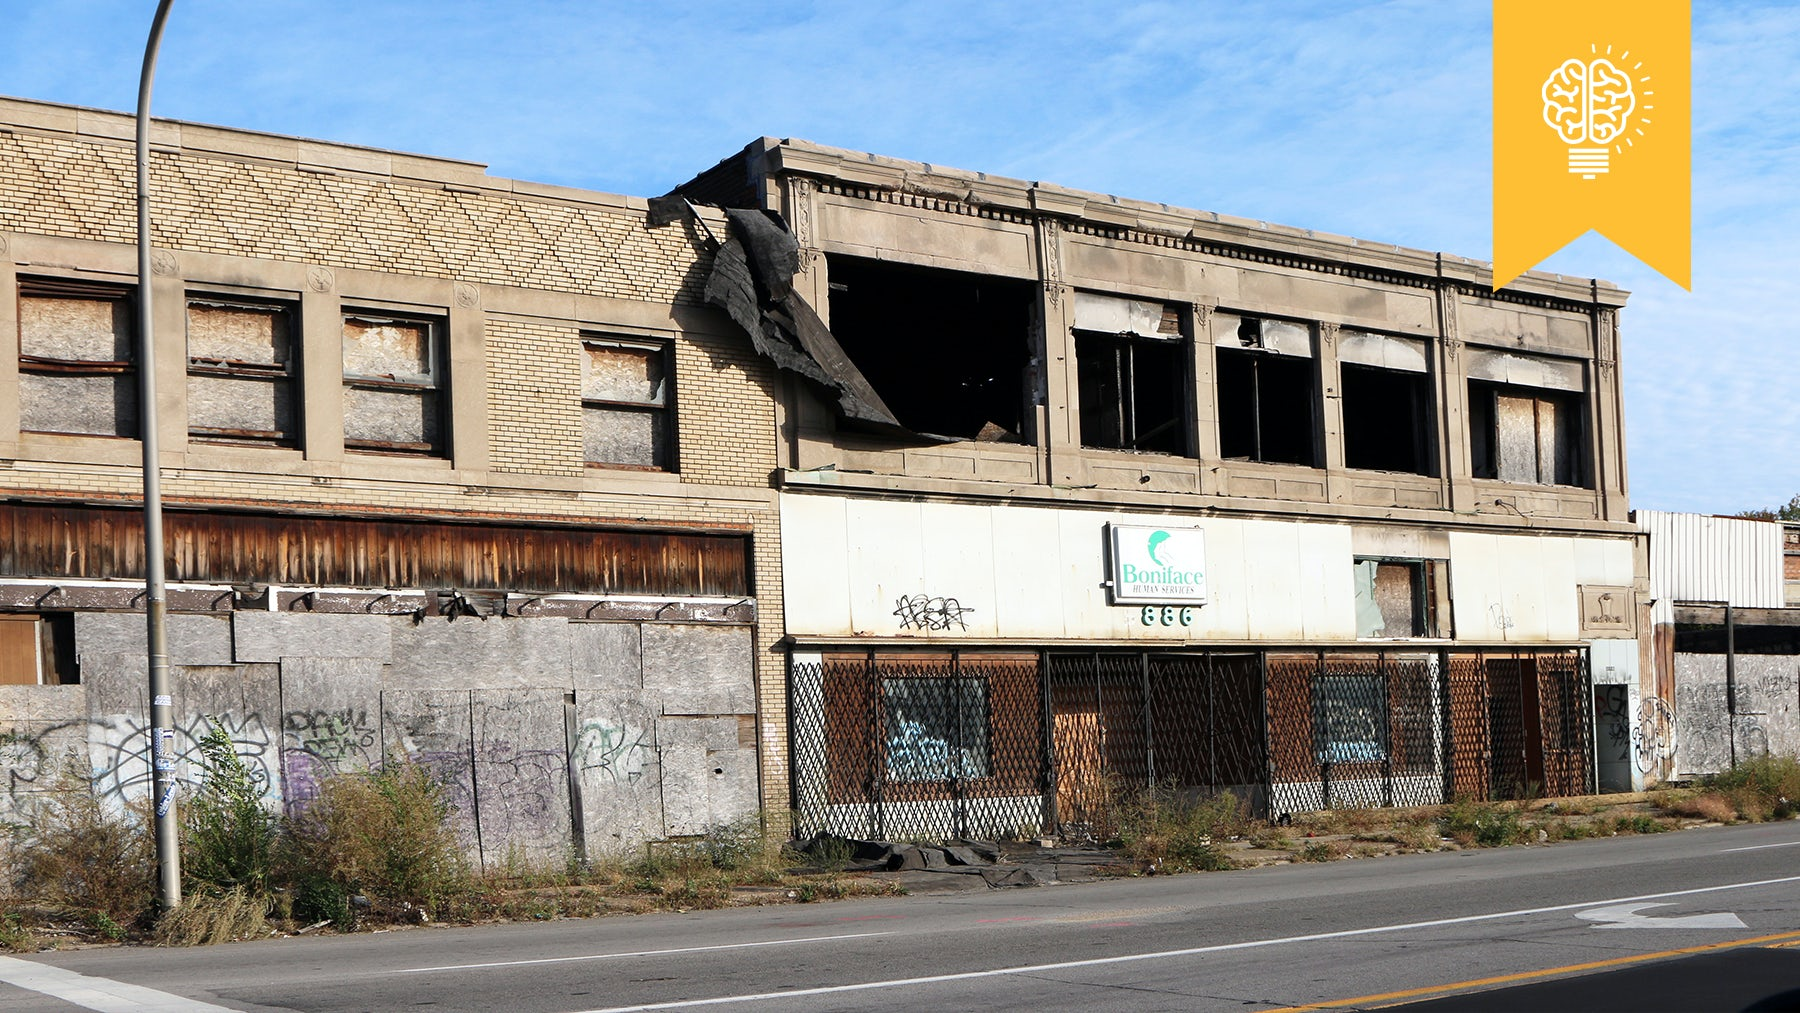 Deserted commercial buildings along one of Detroit's major streets   Source: Shutterstock